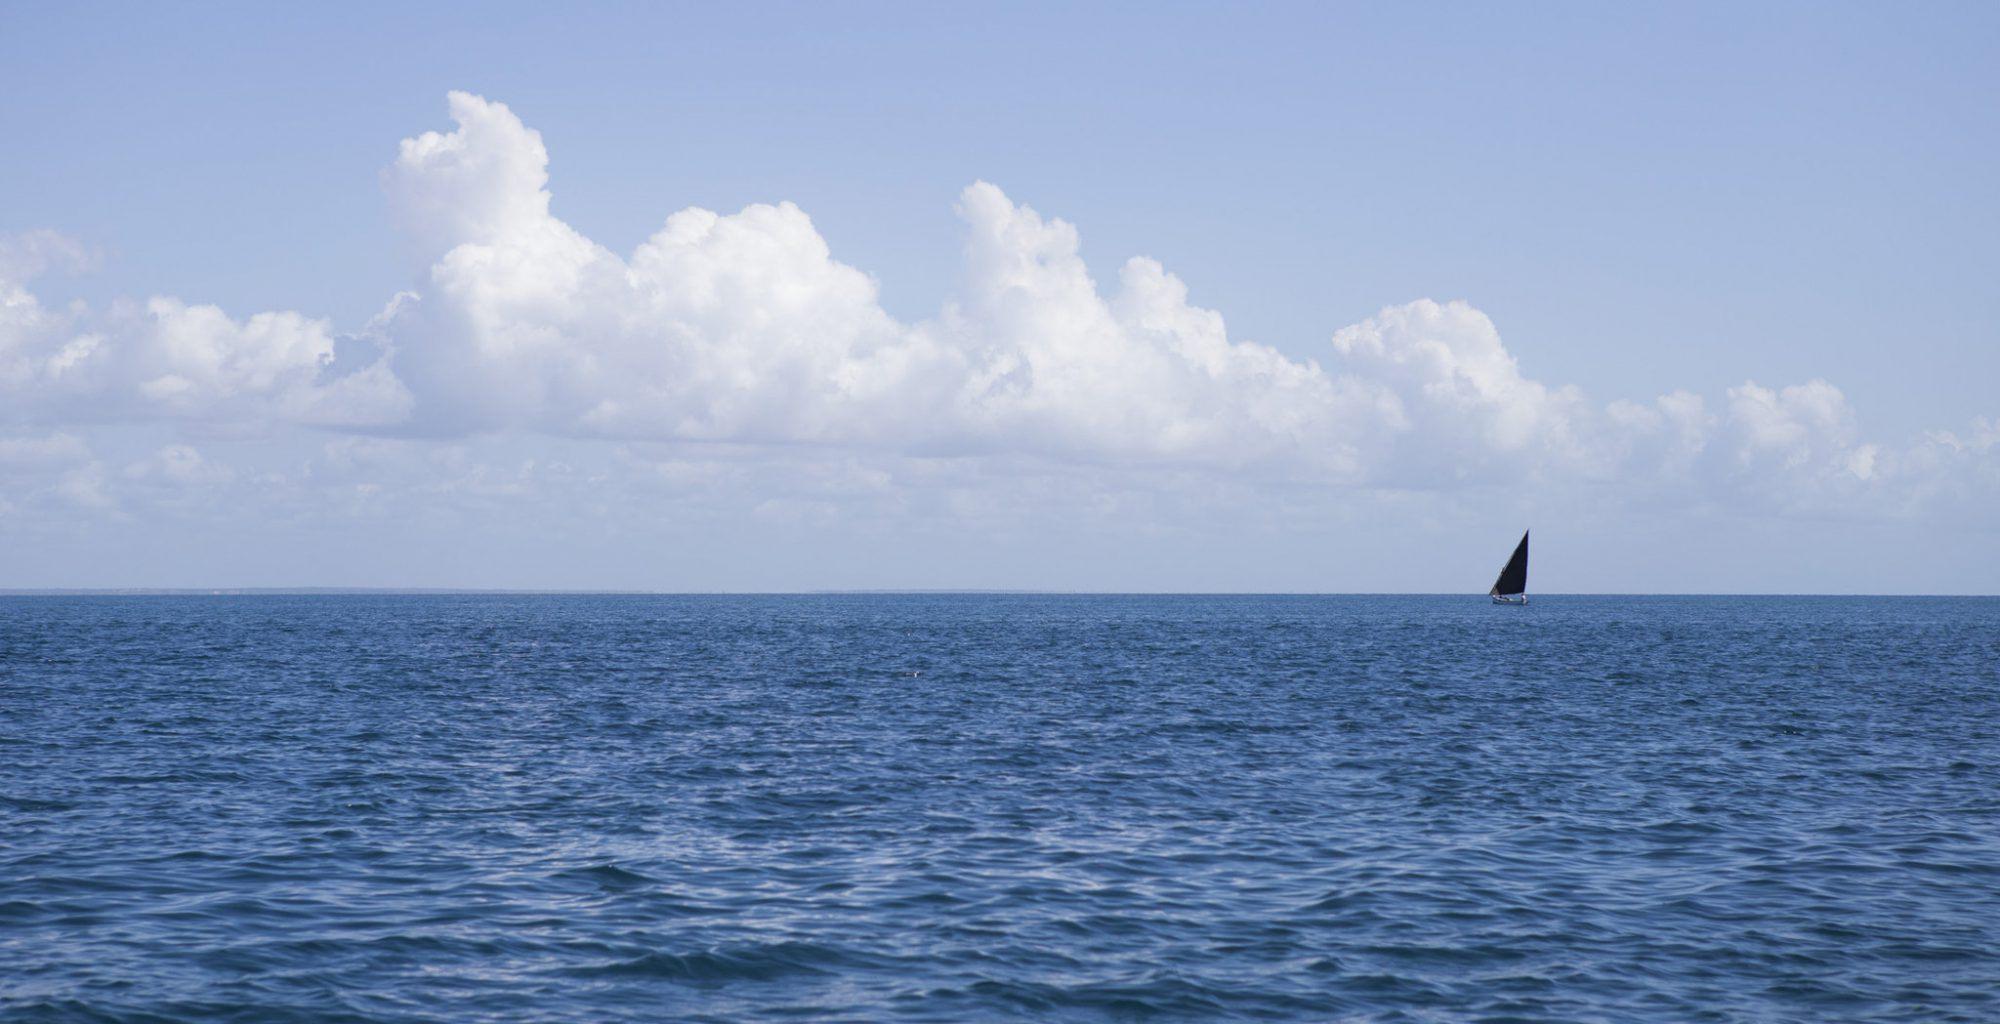 Mozambique-Bazaruto-Archipelago-Dhow-Sailing